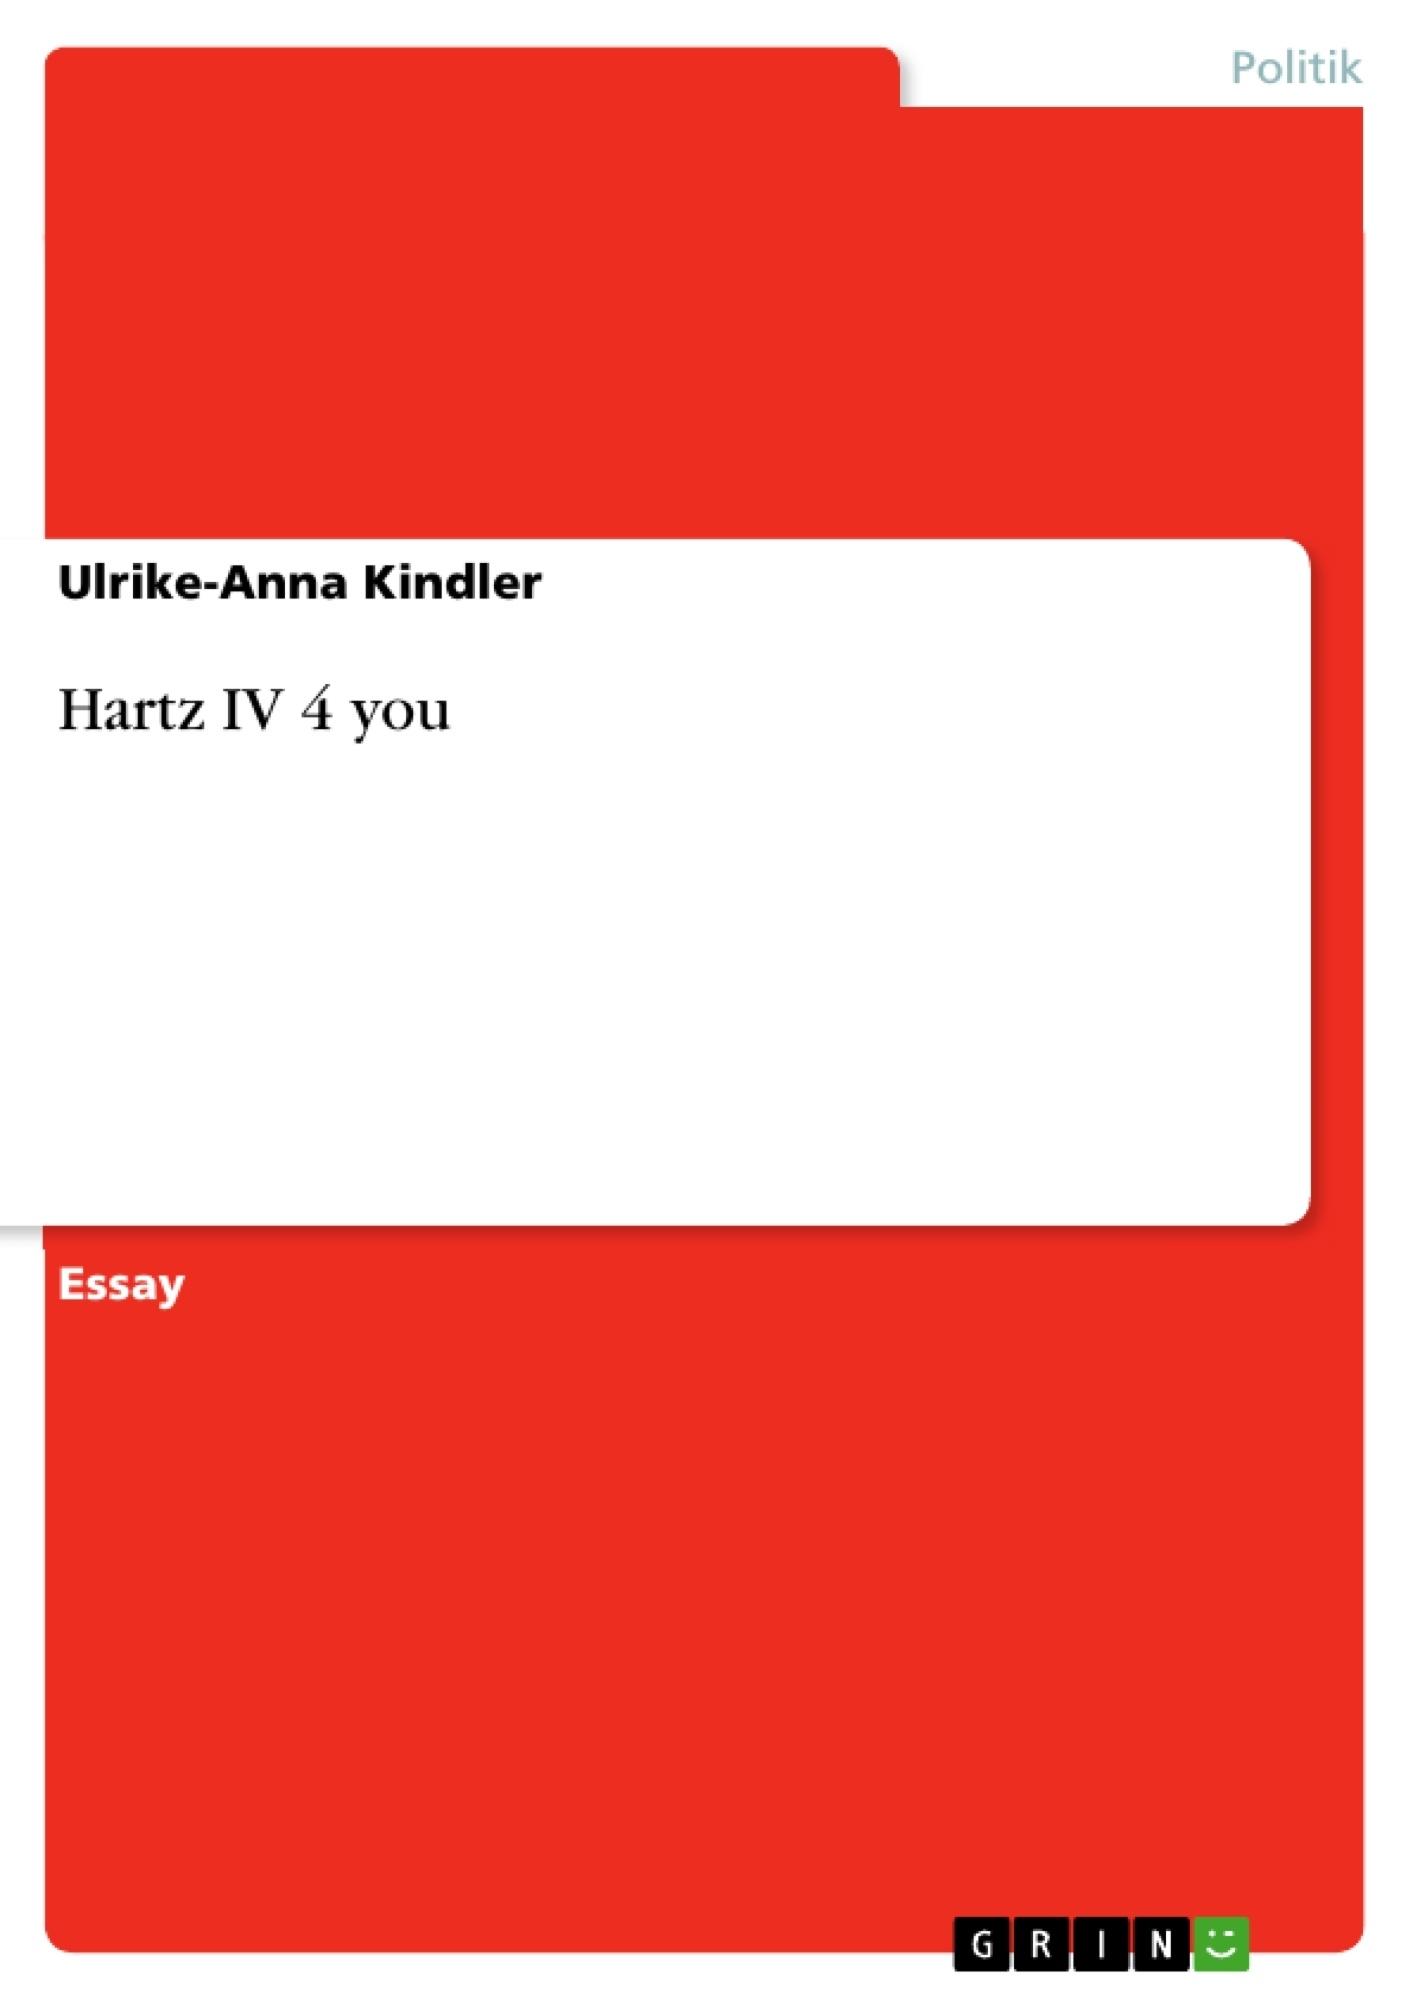 Titel: Hartz IV 4 you